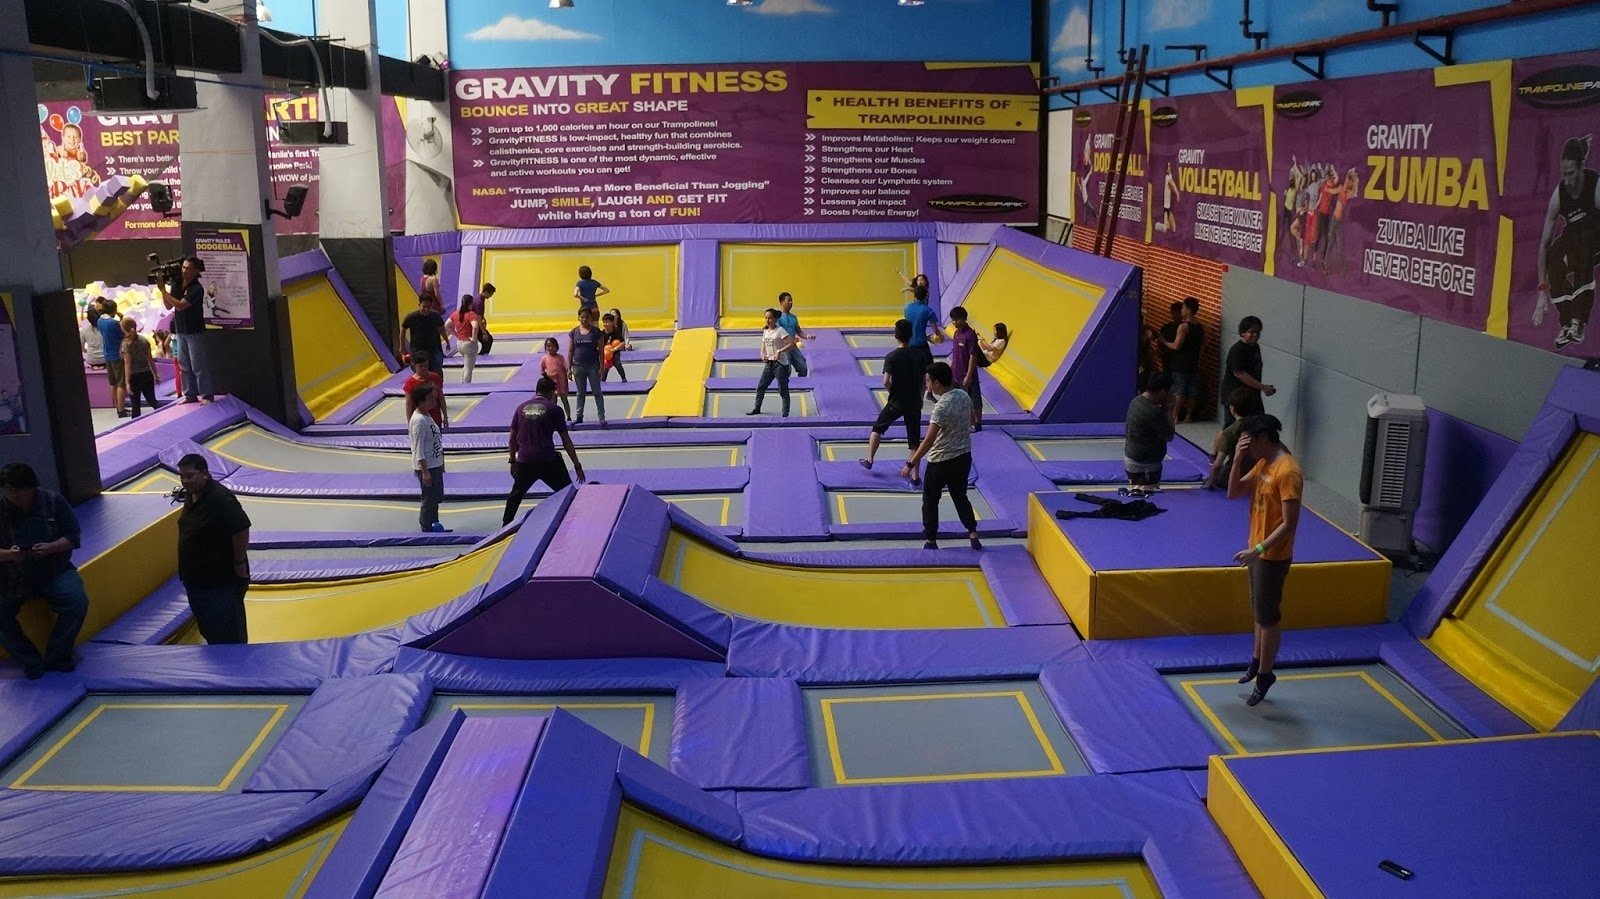 Trampoline Park Zero Gravity Zone: For That Sweaty Yet Fun ...